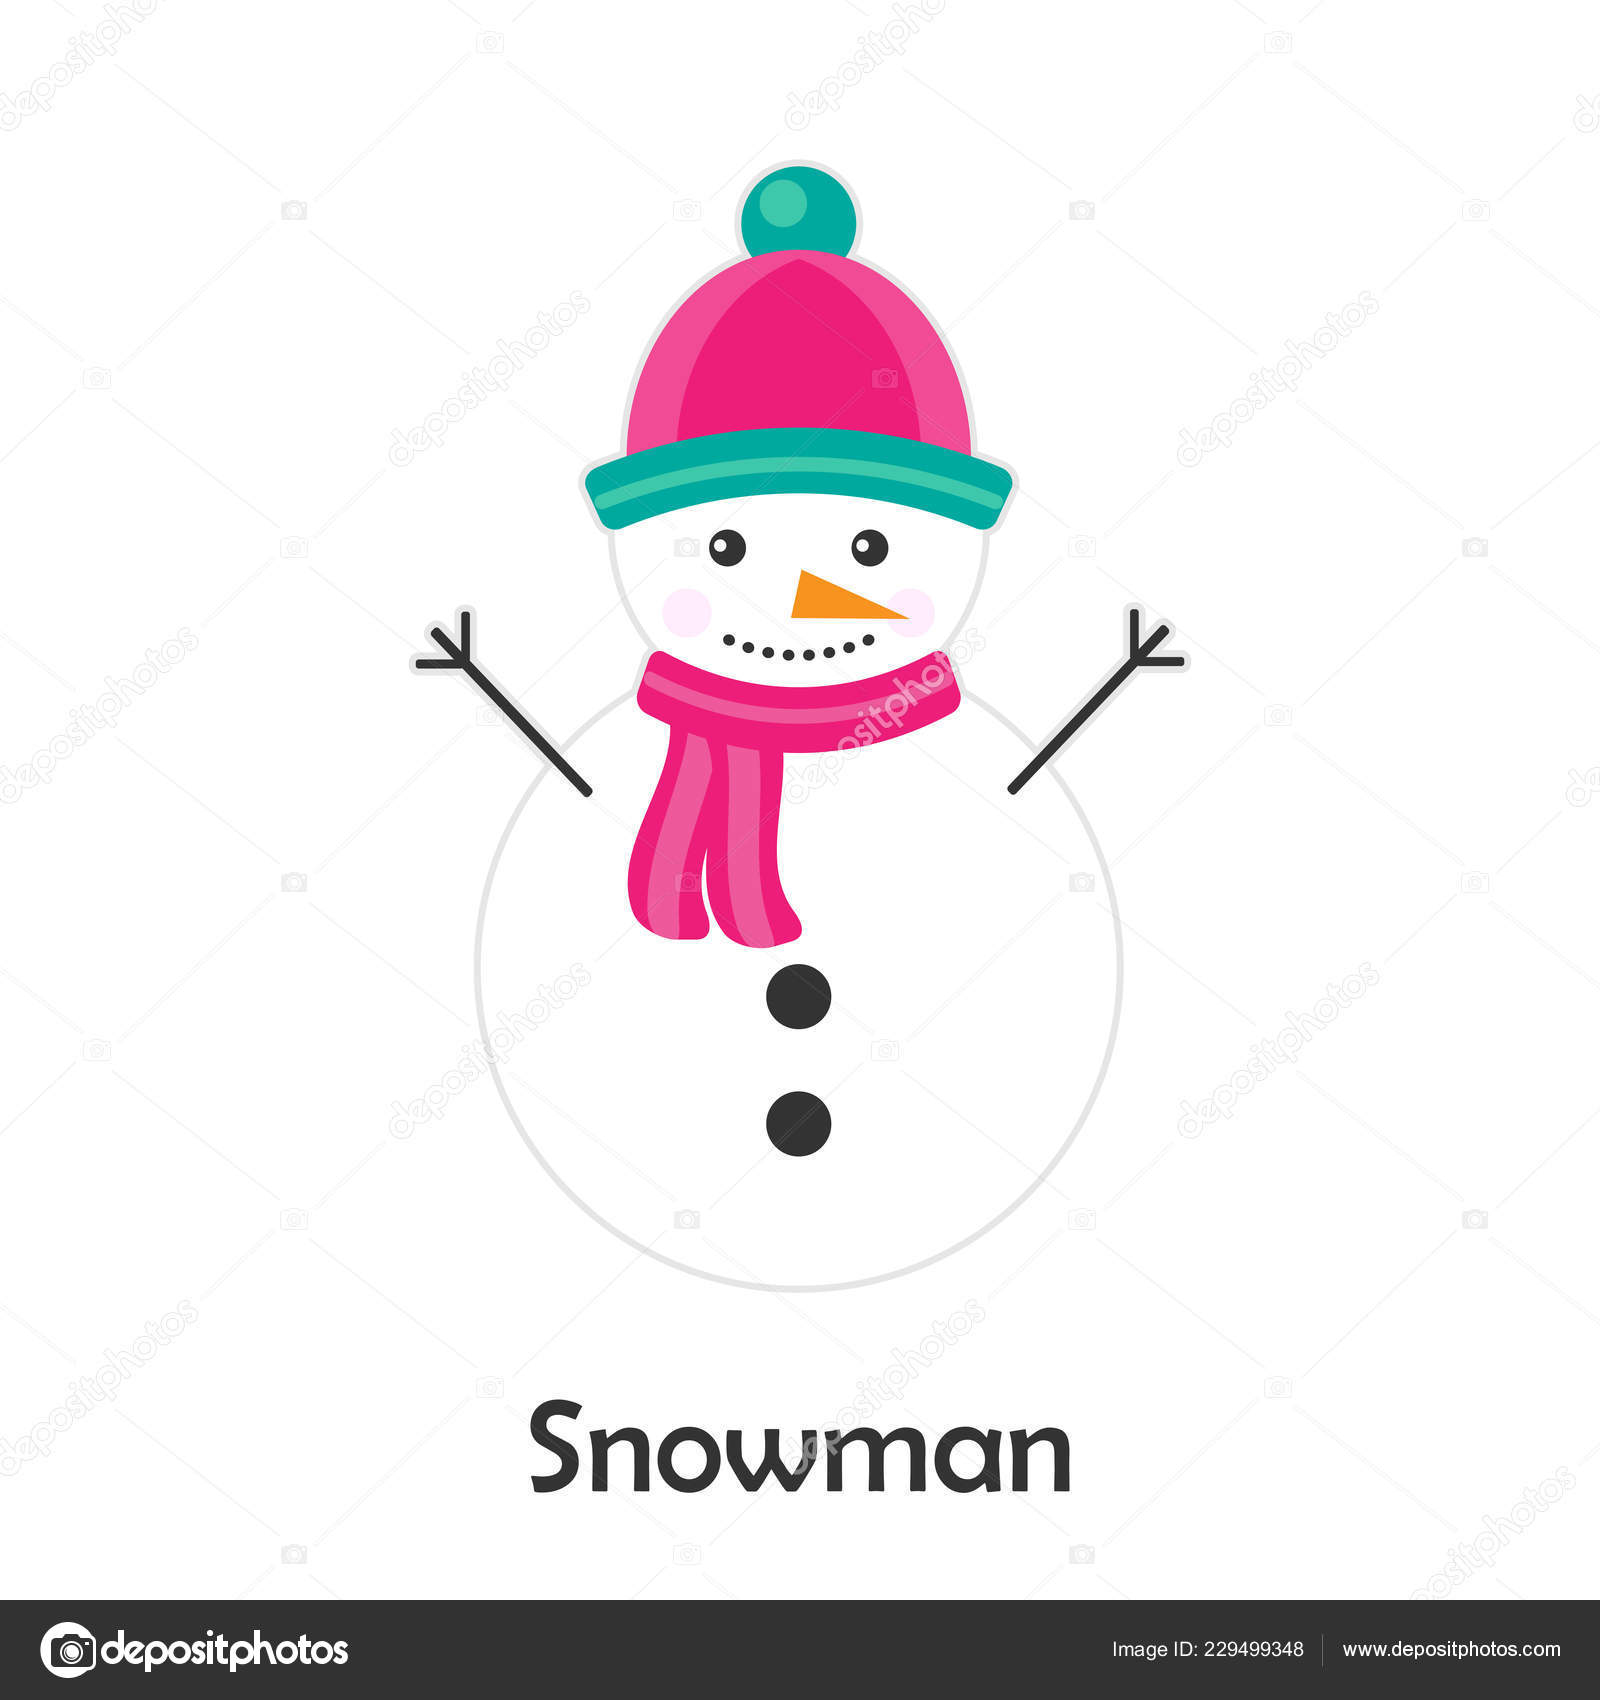 Dibujos Para Tarjetas De Navidad Para Ninos.Muneco Nieve Estilo Dibujos Animados Tarjeta Navidad Para